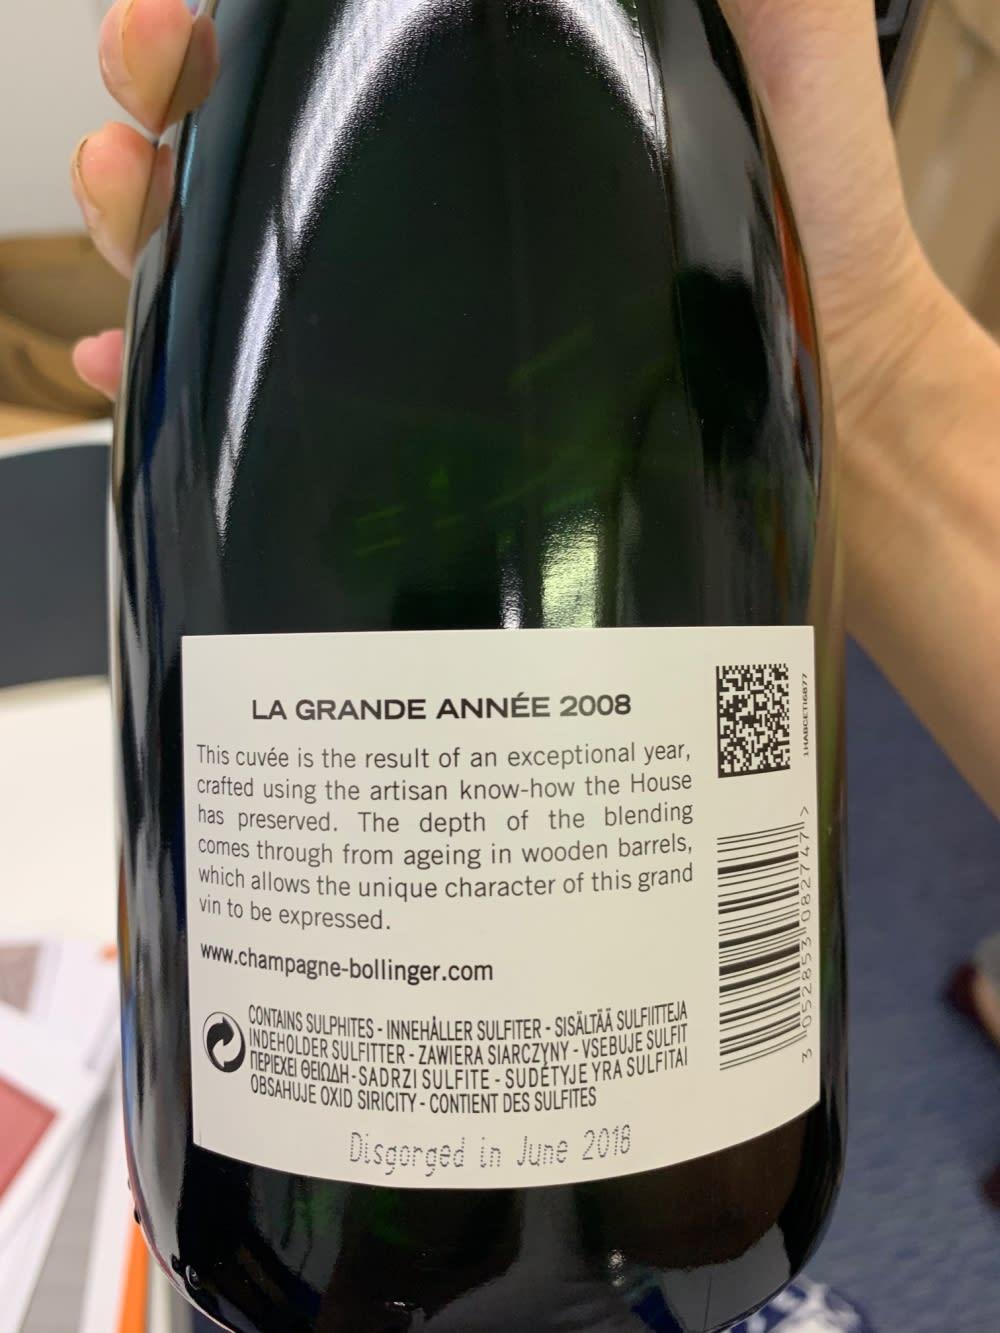 ames Bond Champagne Bollinger La Grande Année 2008